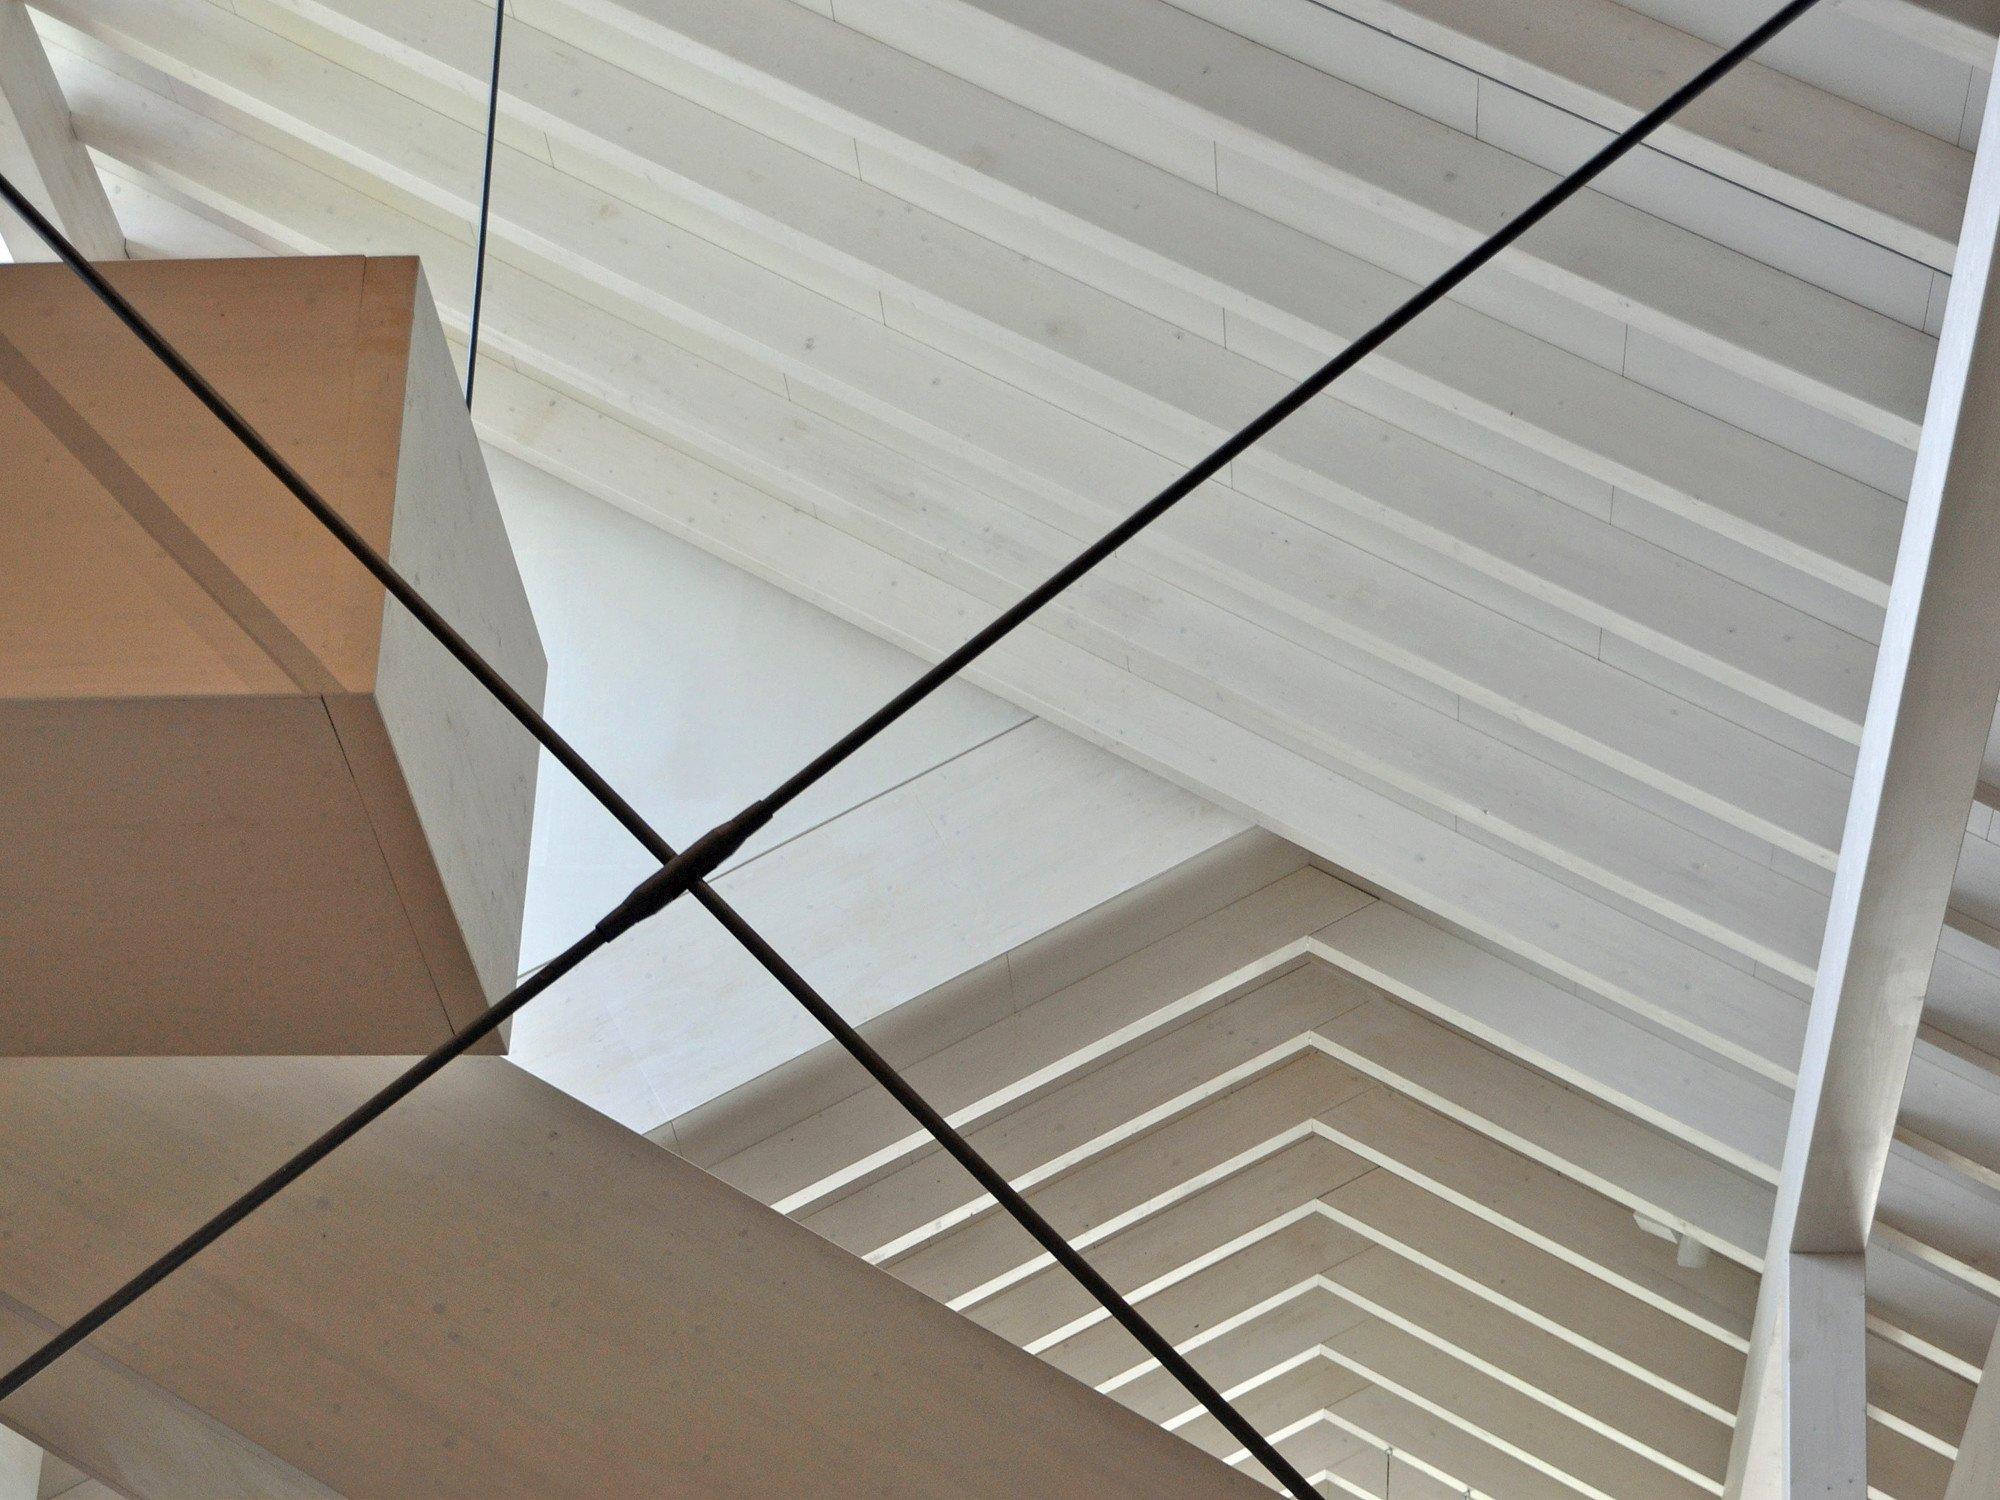 Dachsanierung Mit Diffusionsoffener Folie Geneigtes Dach